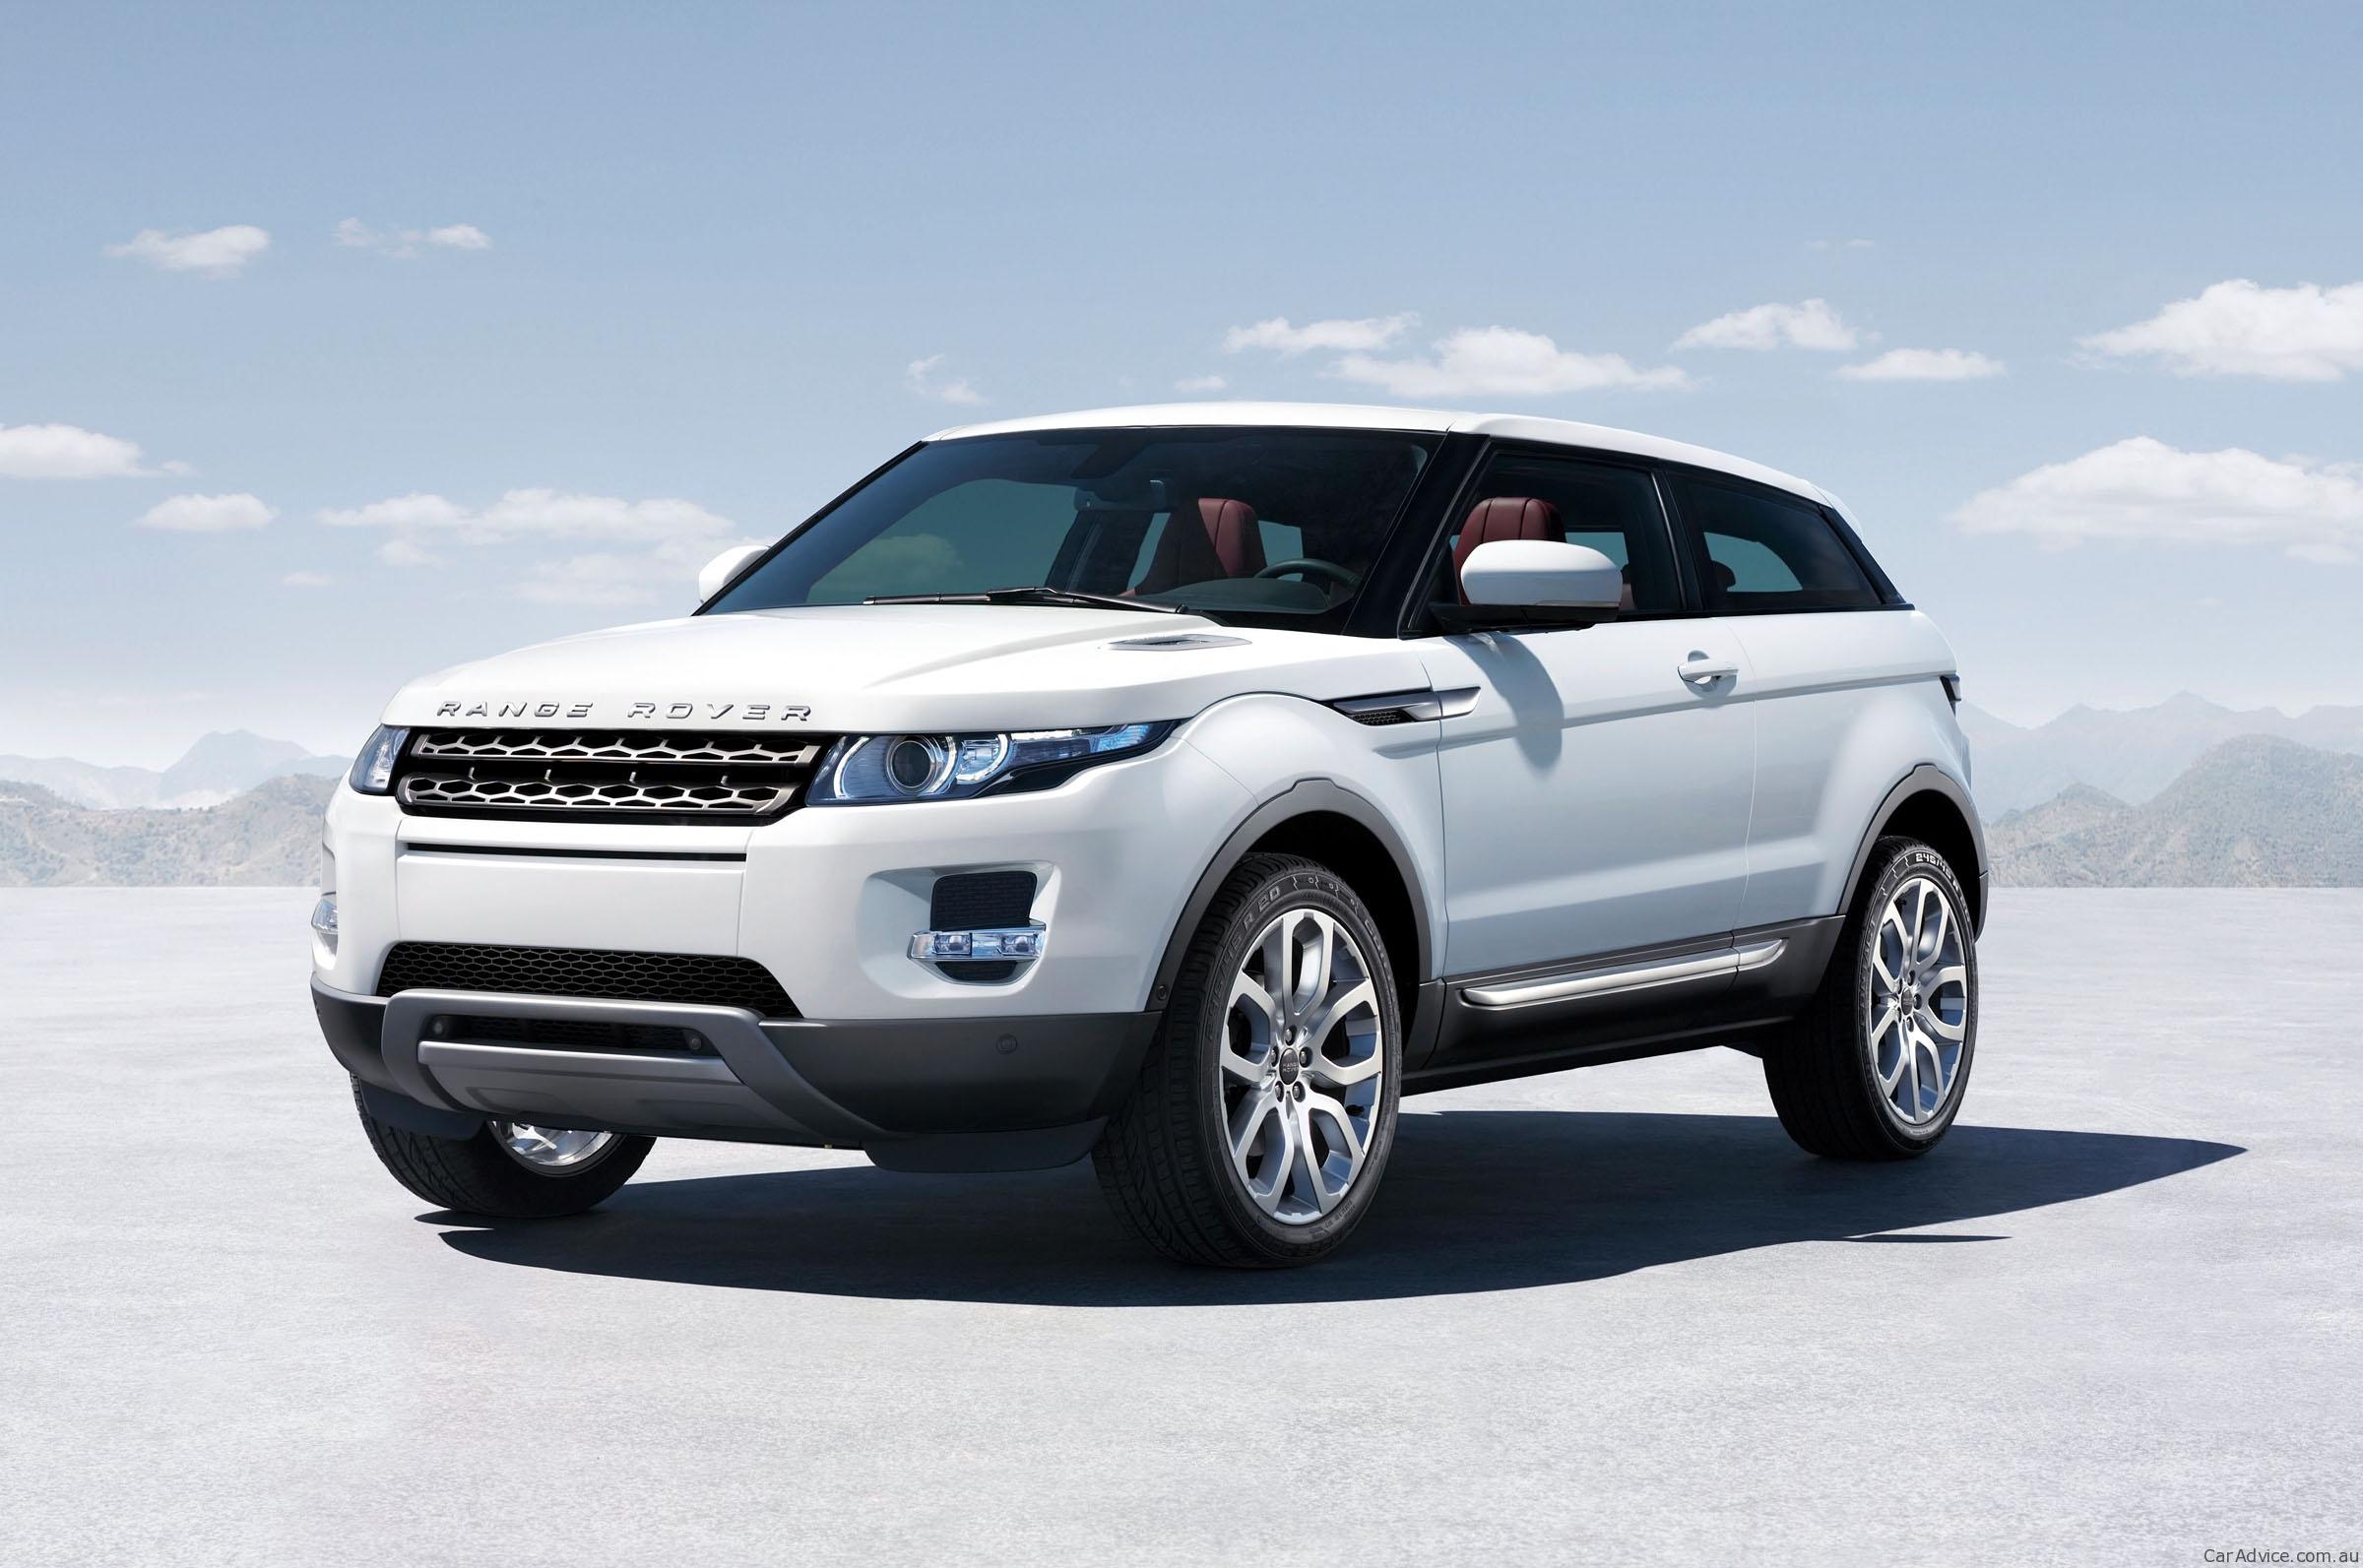 Range Rover Evoque - Report